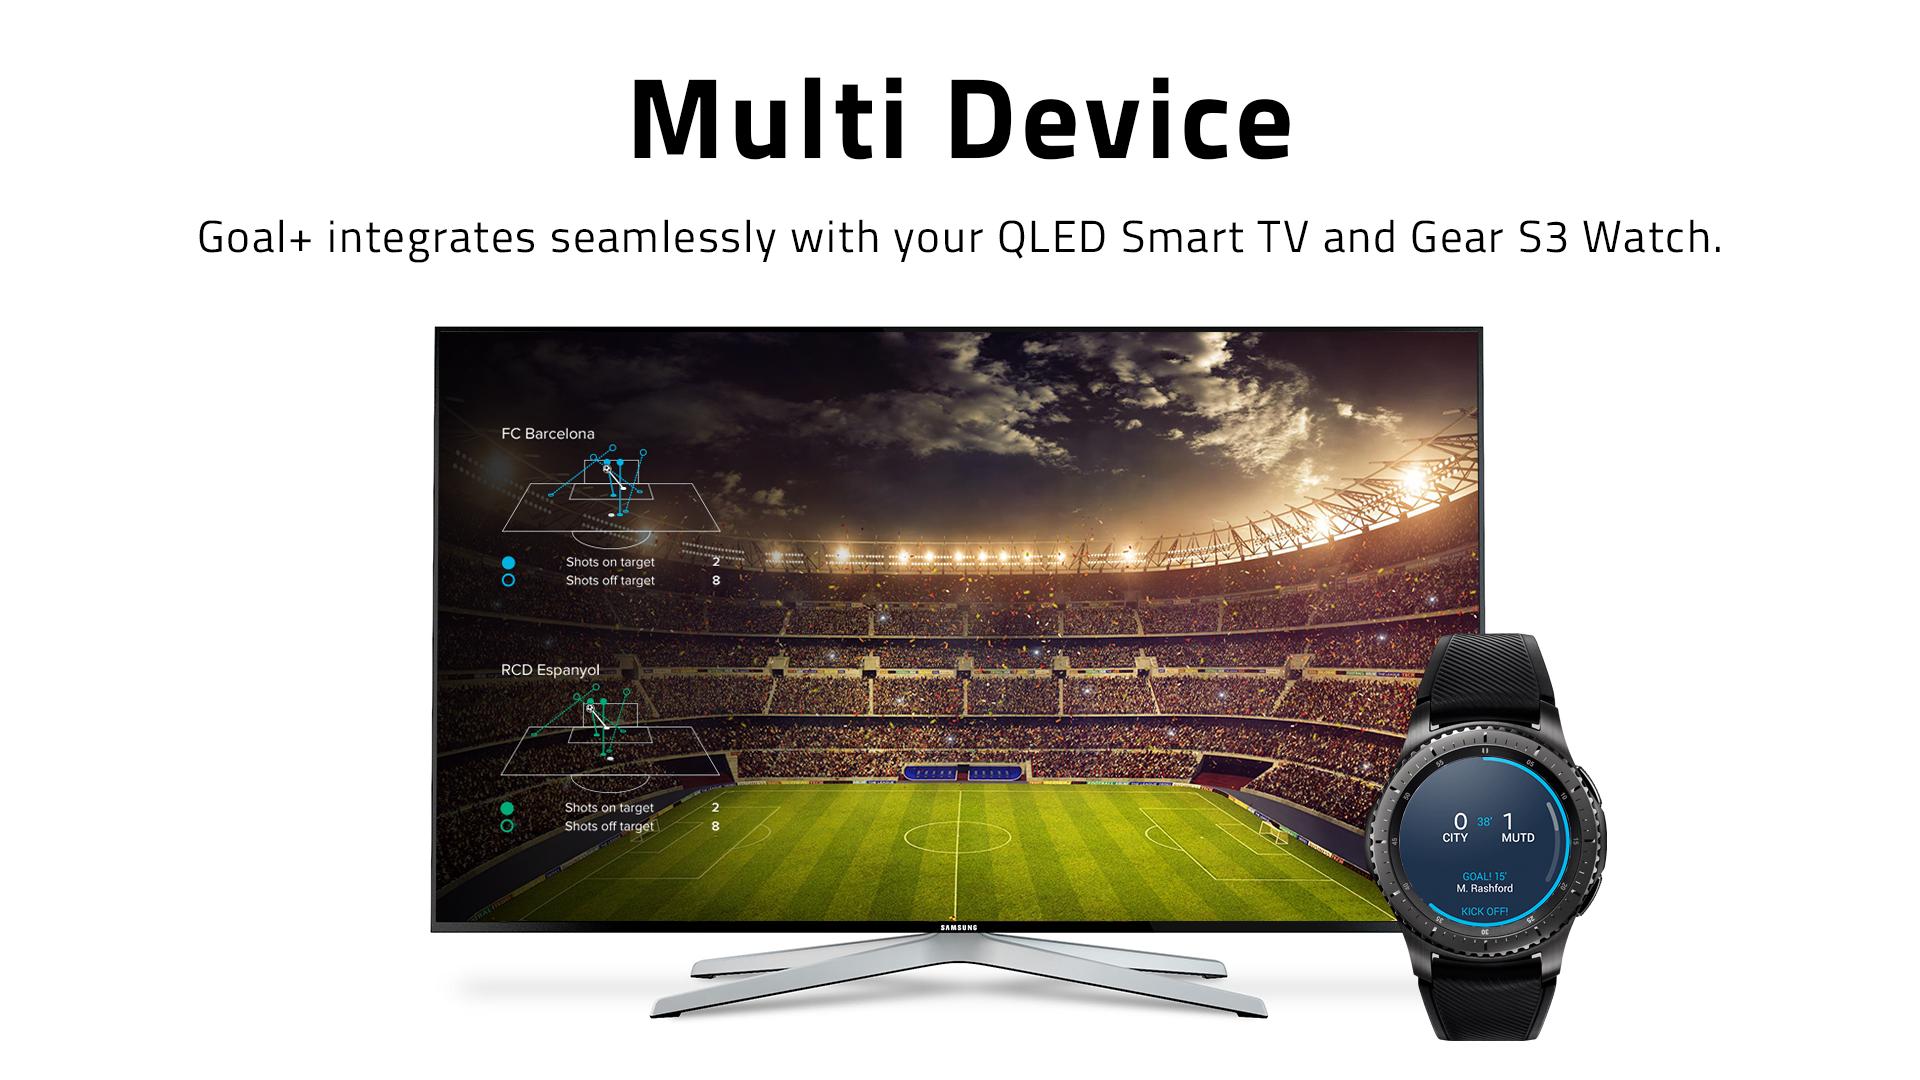 Samsung Goal+ S9 multi device